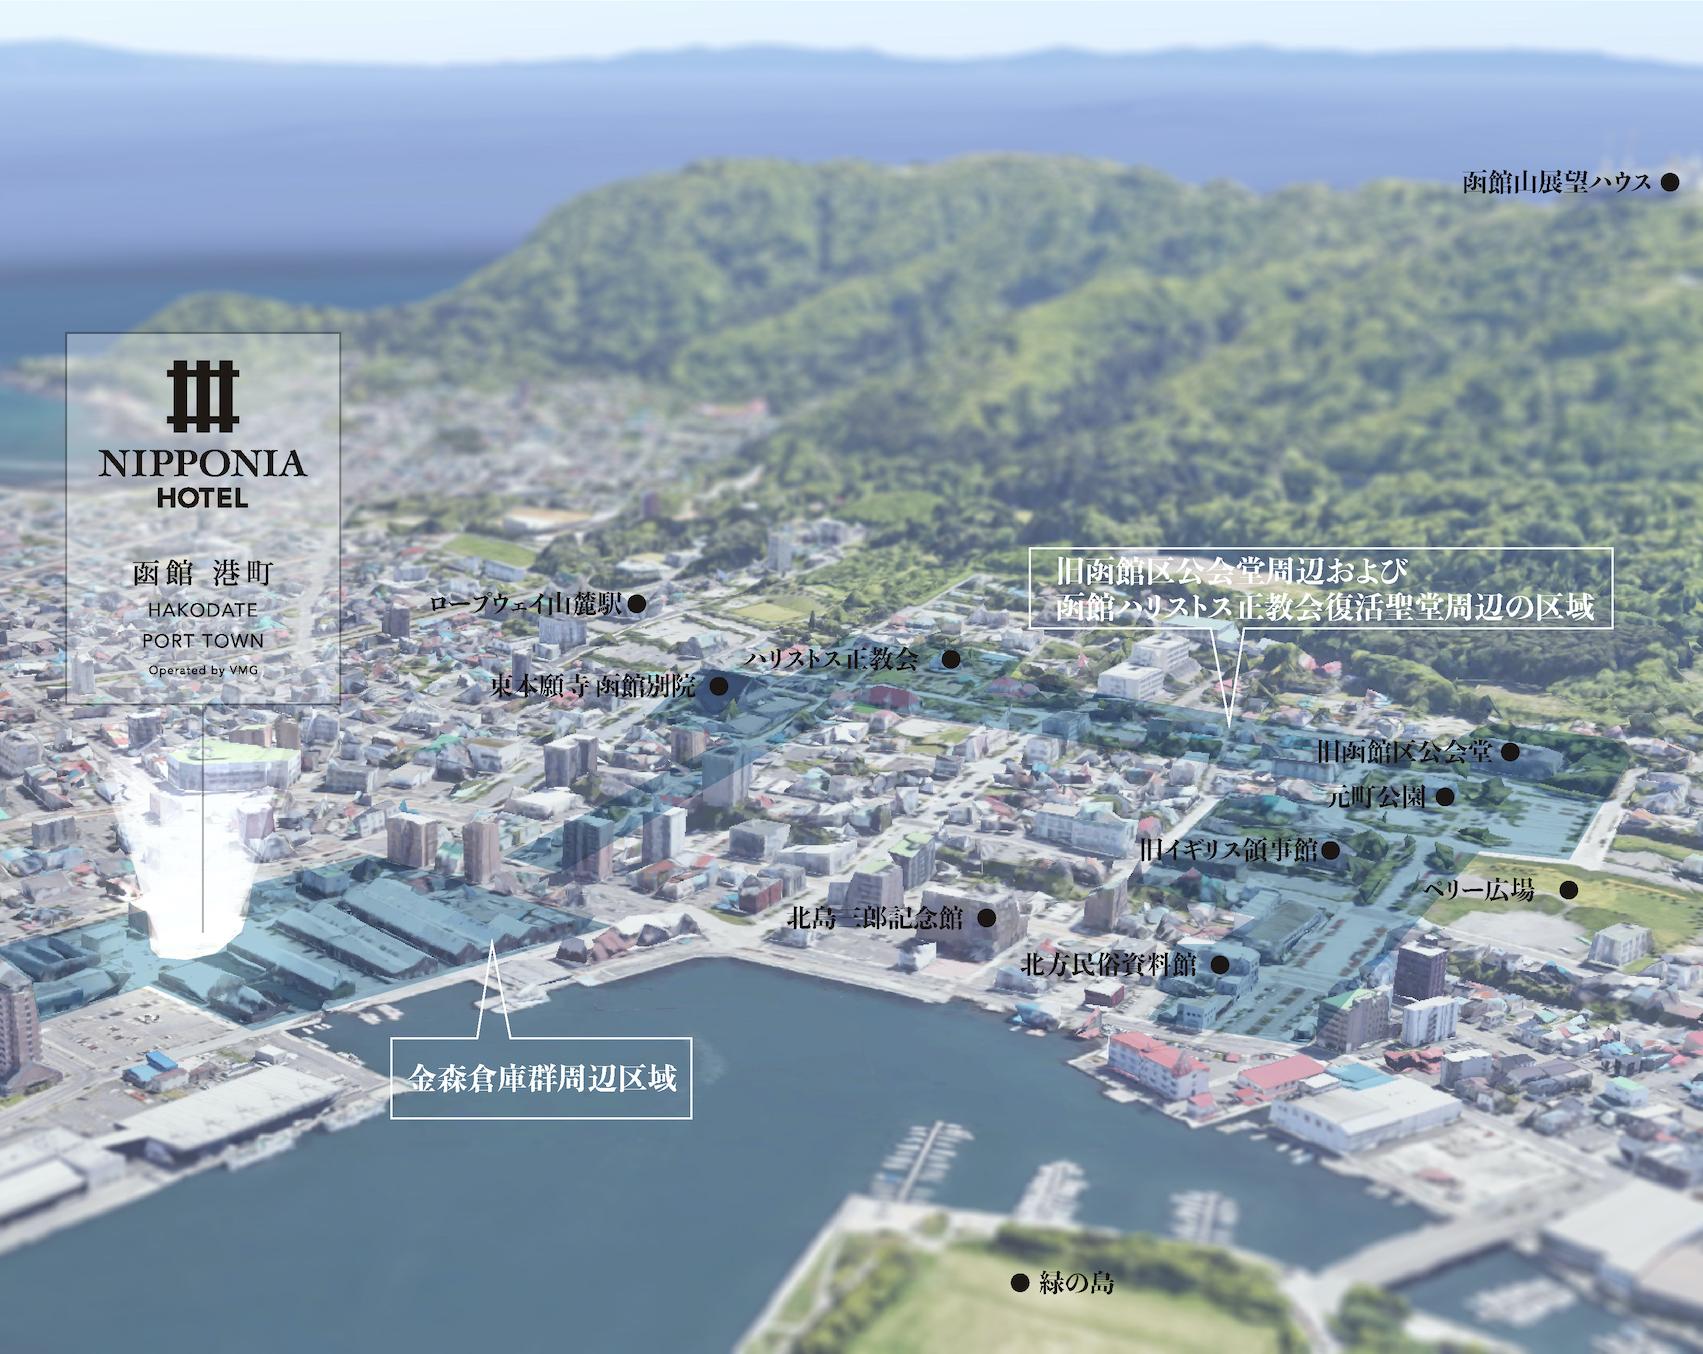 NIPPONIA HOTEL 函館 港町の所在マップ